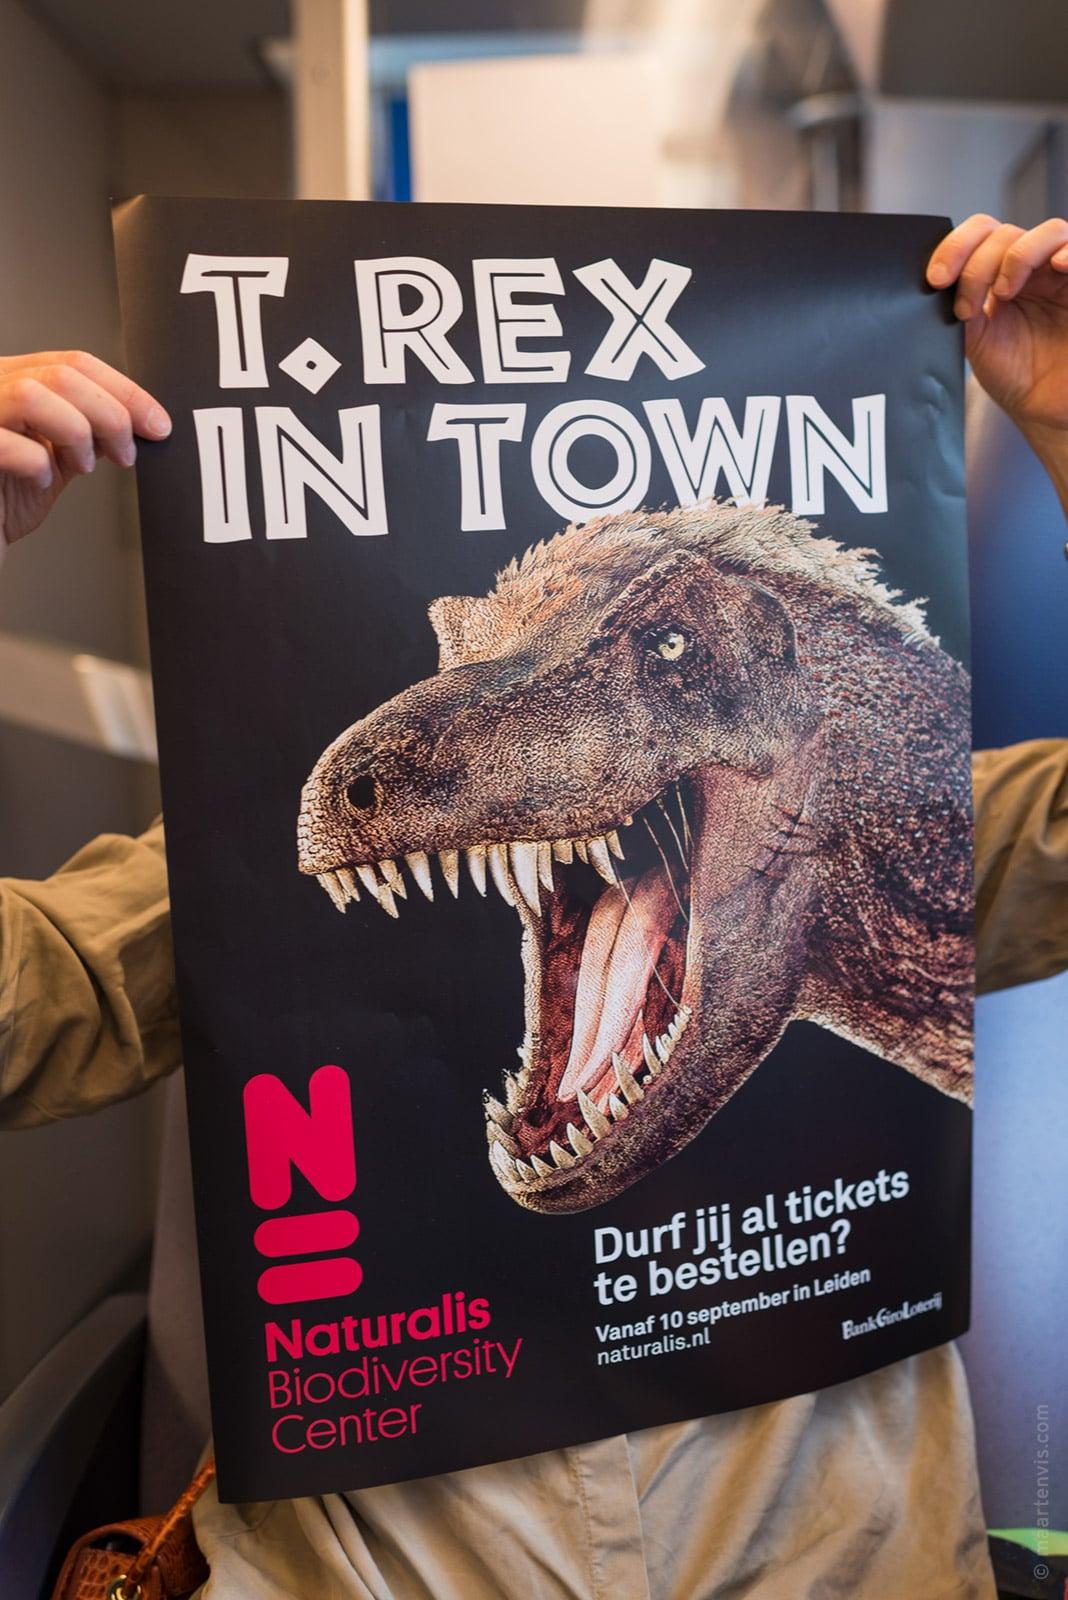 Meeting T-Rex Trix The Netherlands   Meeting T-Rex Trix The Netherlands   Meeting T-Rex Trix The Netherlands   Meeting T-Rex Trix The Netherlands   Meeting T-Rex Trix The Netherlands